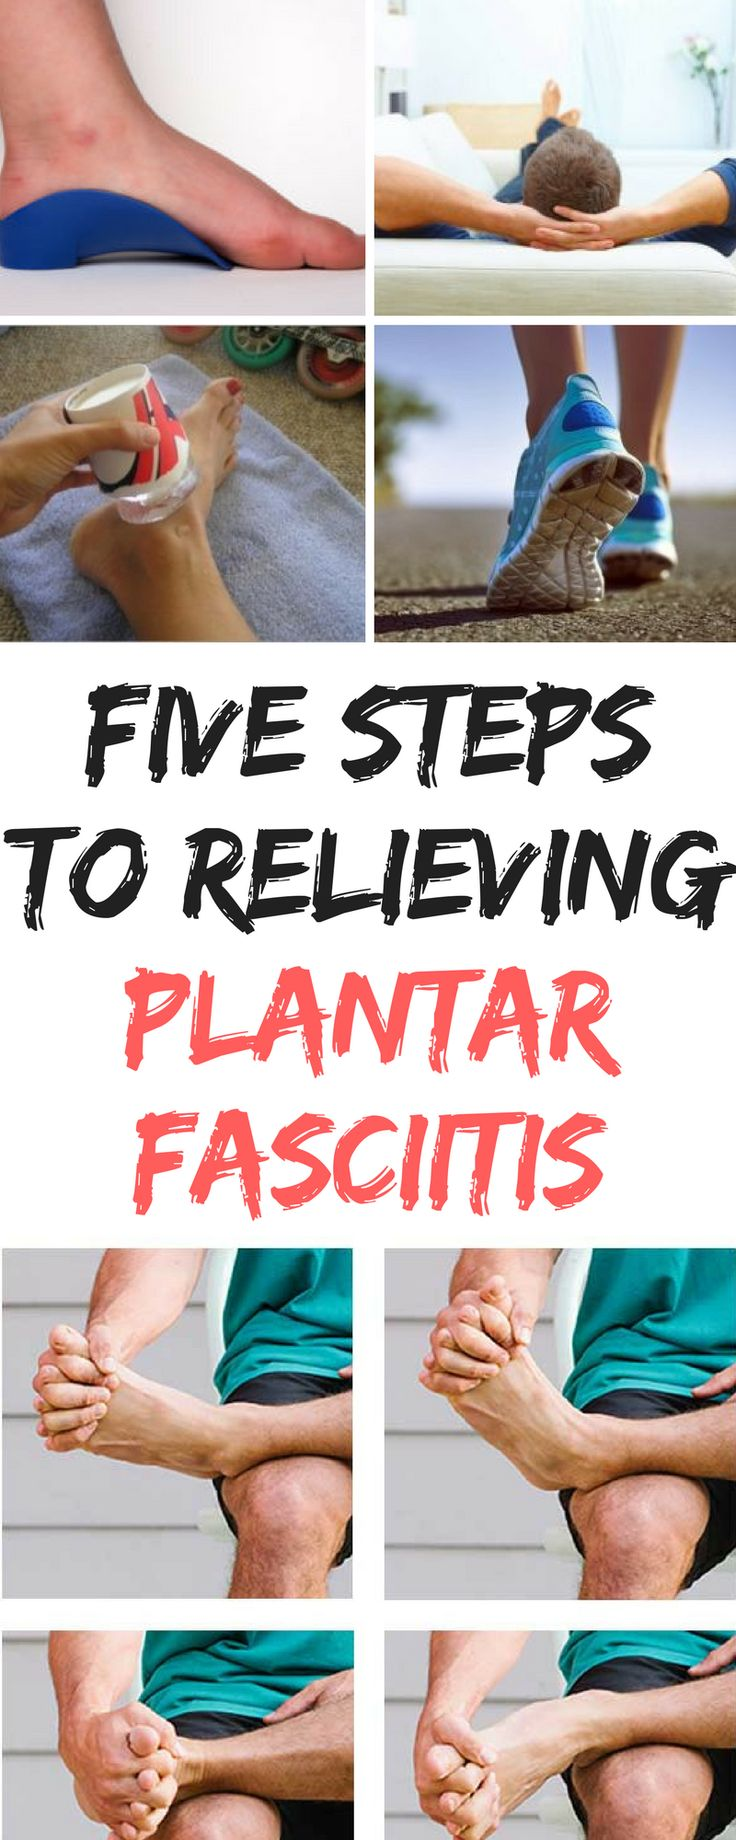 FIVE STEPS to Relieving PLANTAR FASCIITIS #plantarfasciitis